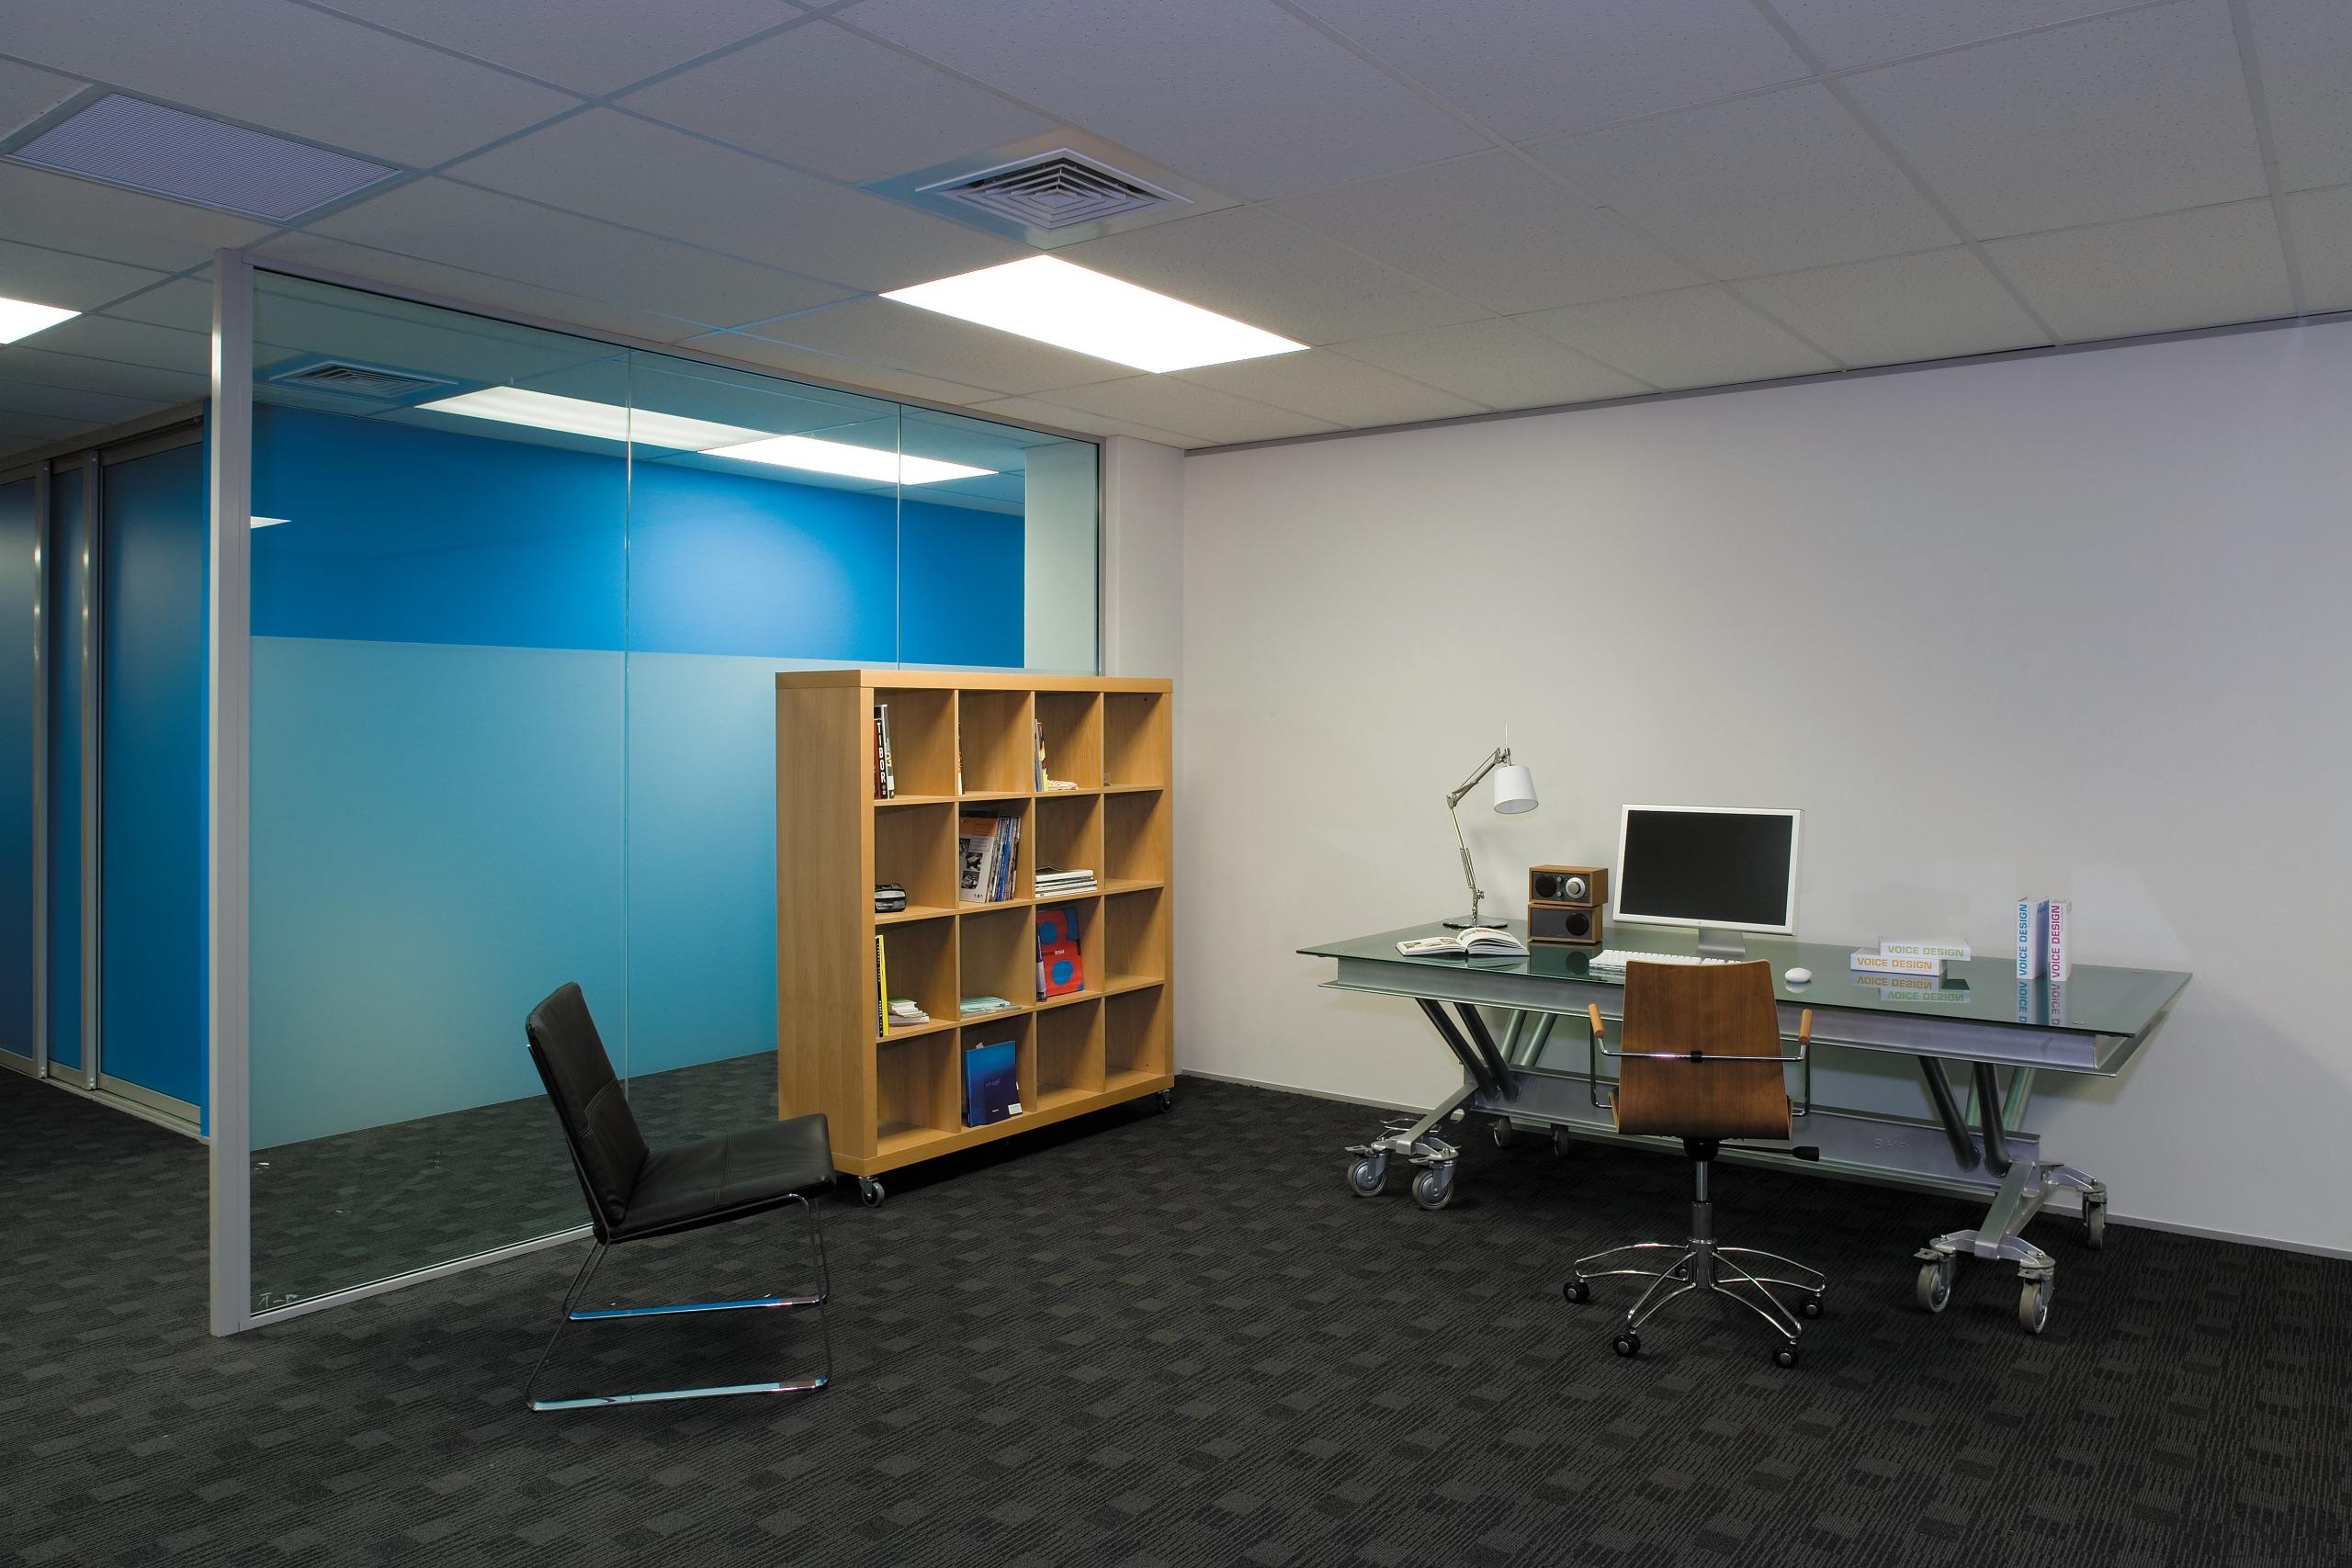 All surfaces in the Trends premises, including workstations, desk, floor, furniture, interior design, office, product design, gray, black